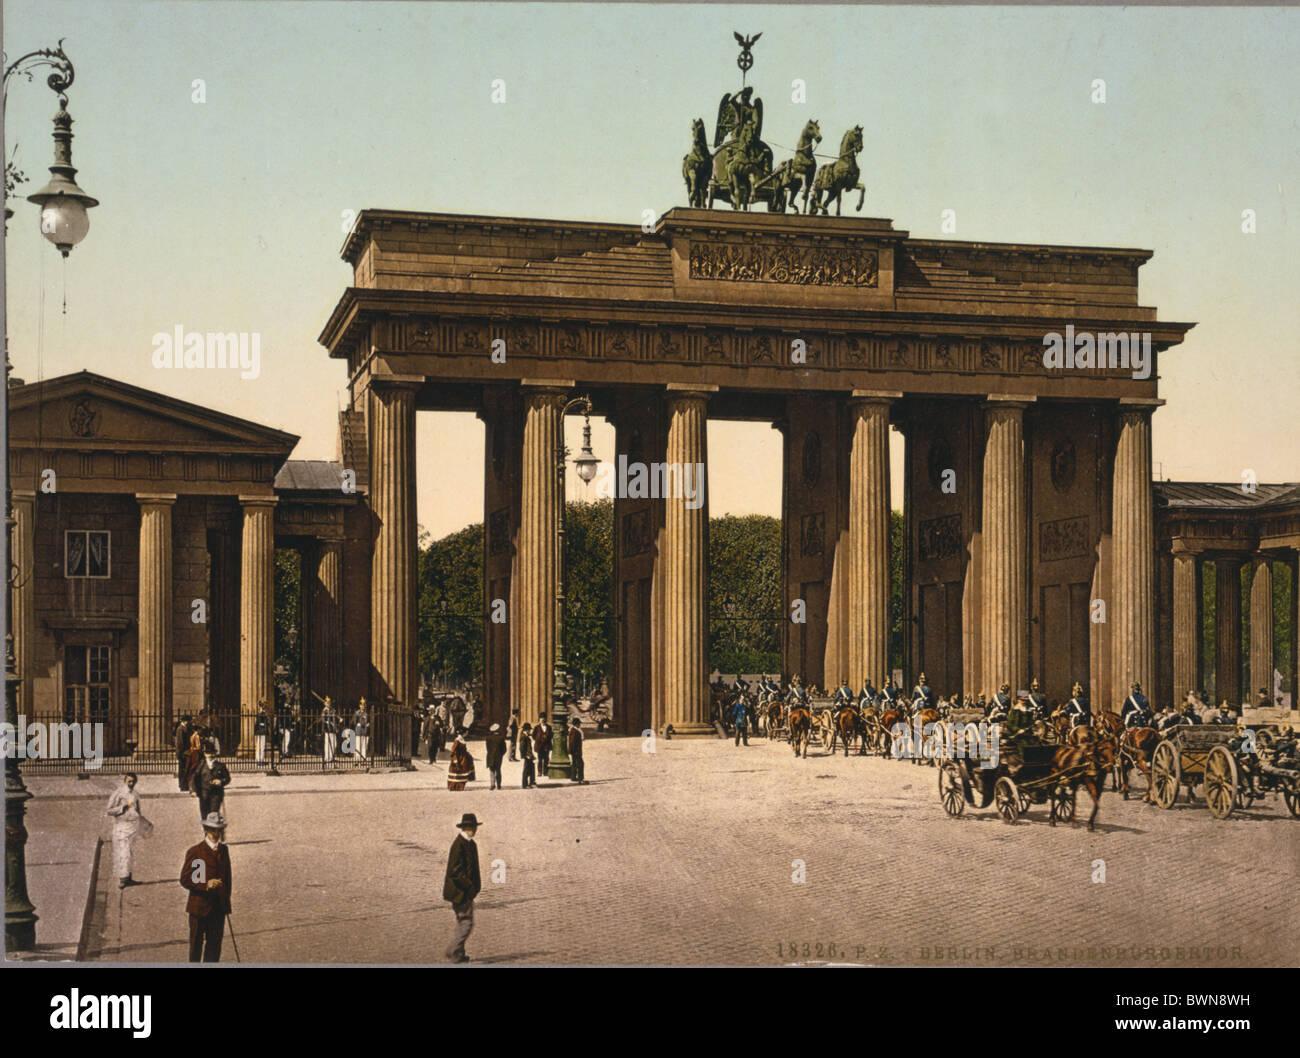 Brandenburger Tor Berlin between 1890 and 1900 history historical historic town traffic people landmark Bran - Stock Image